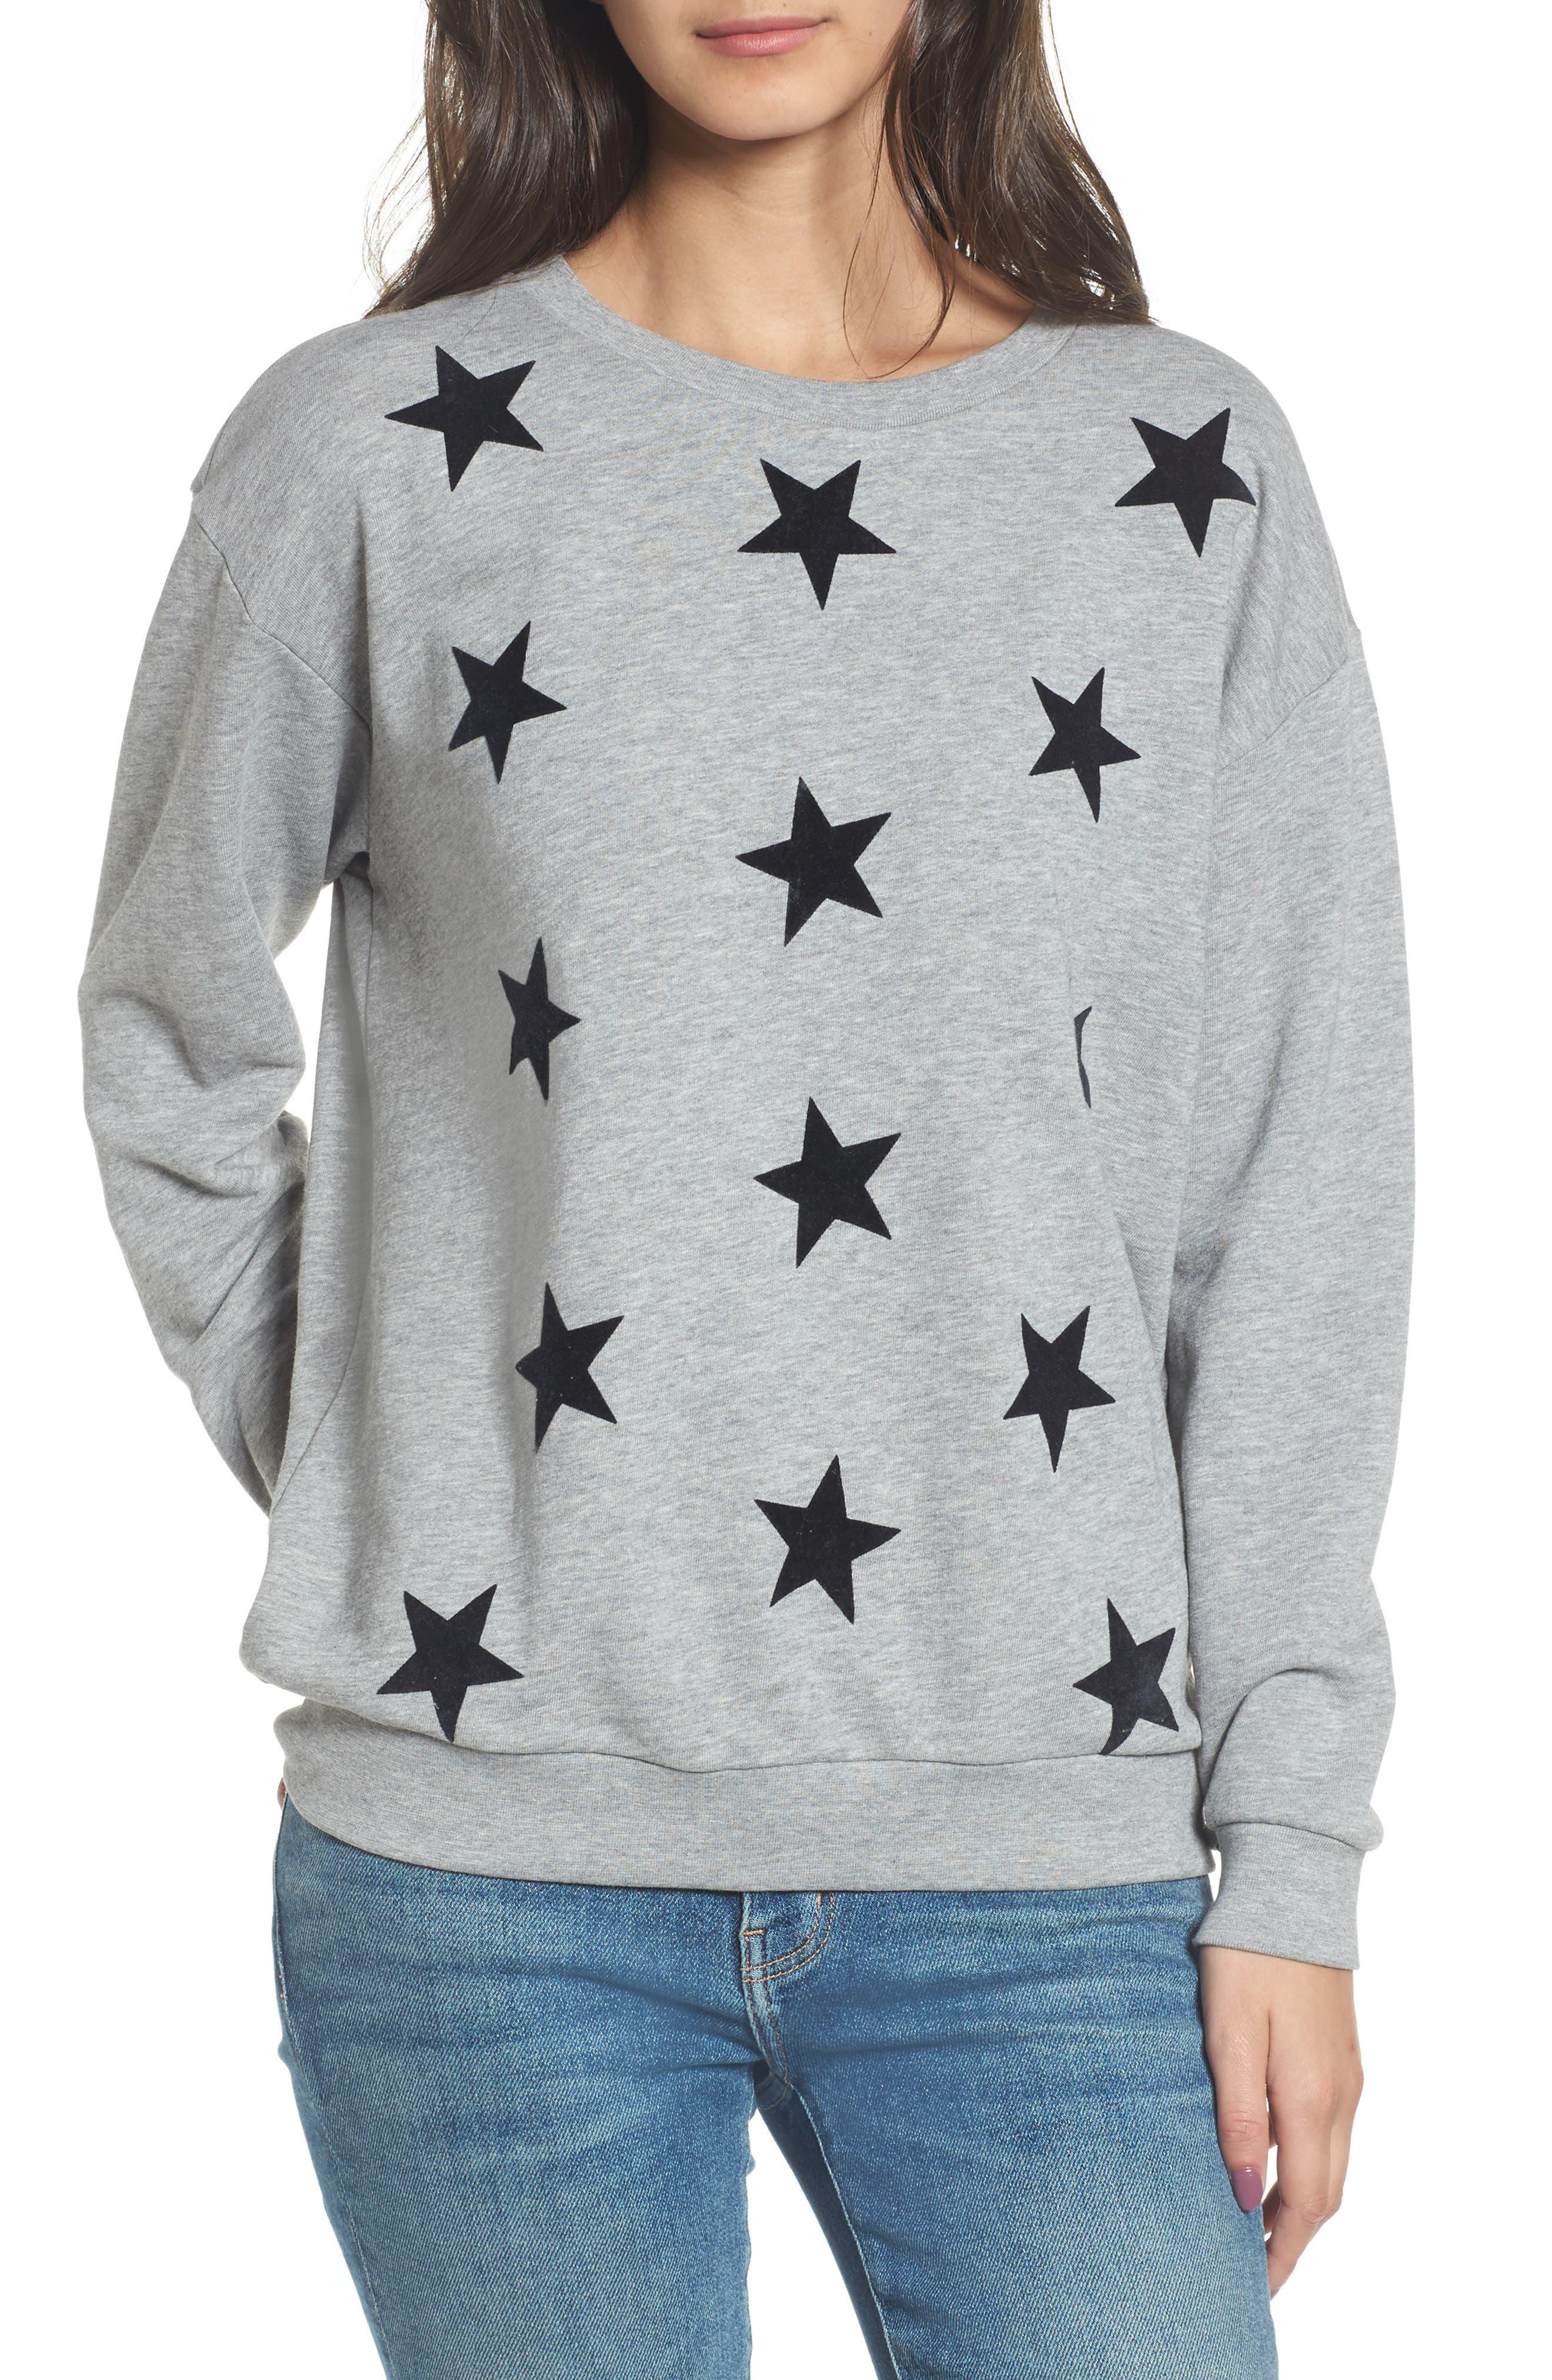 Alexa - Super Stars Sweatshirt,                         Main,                         color, Grey